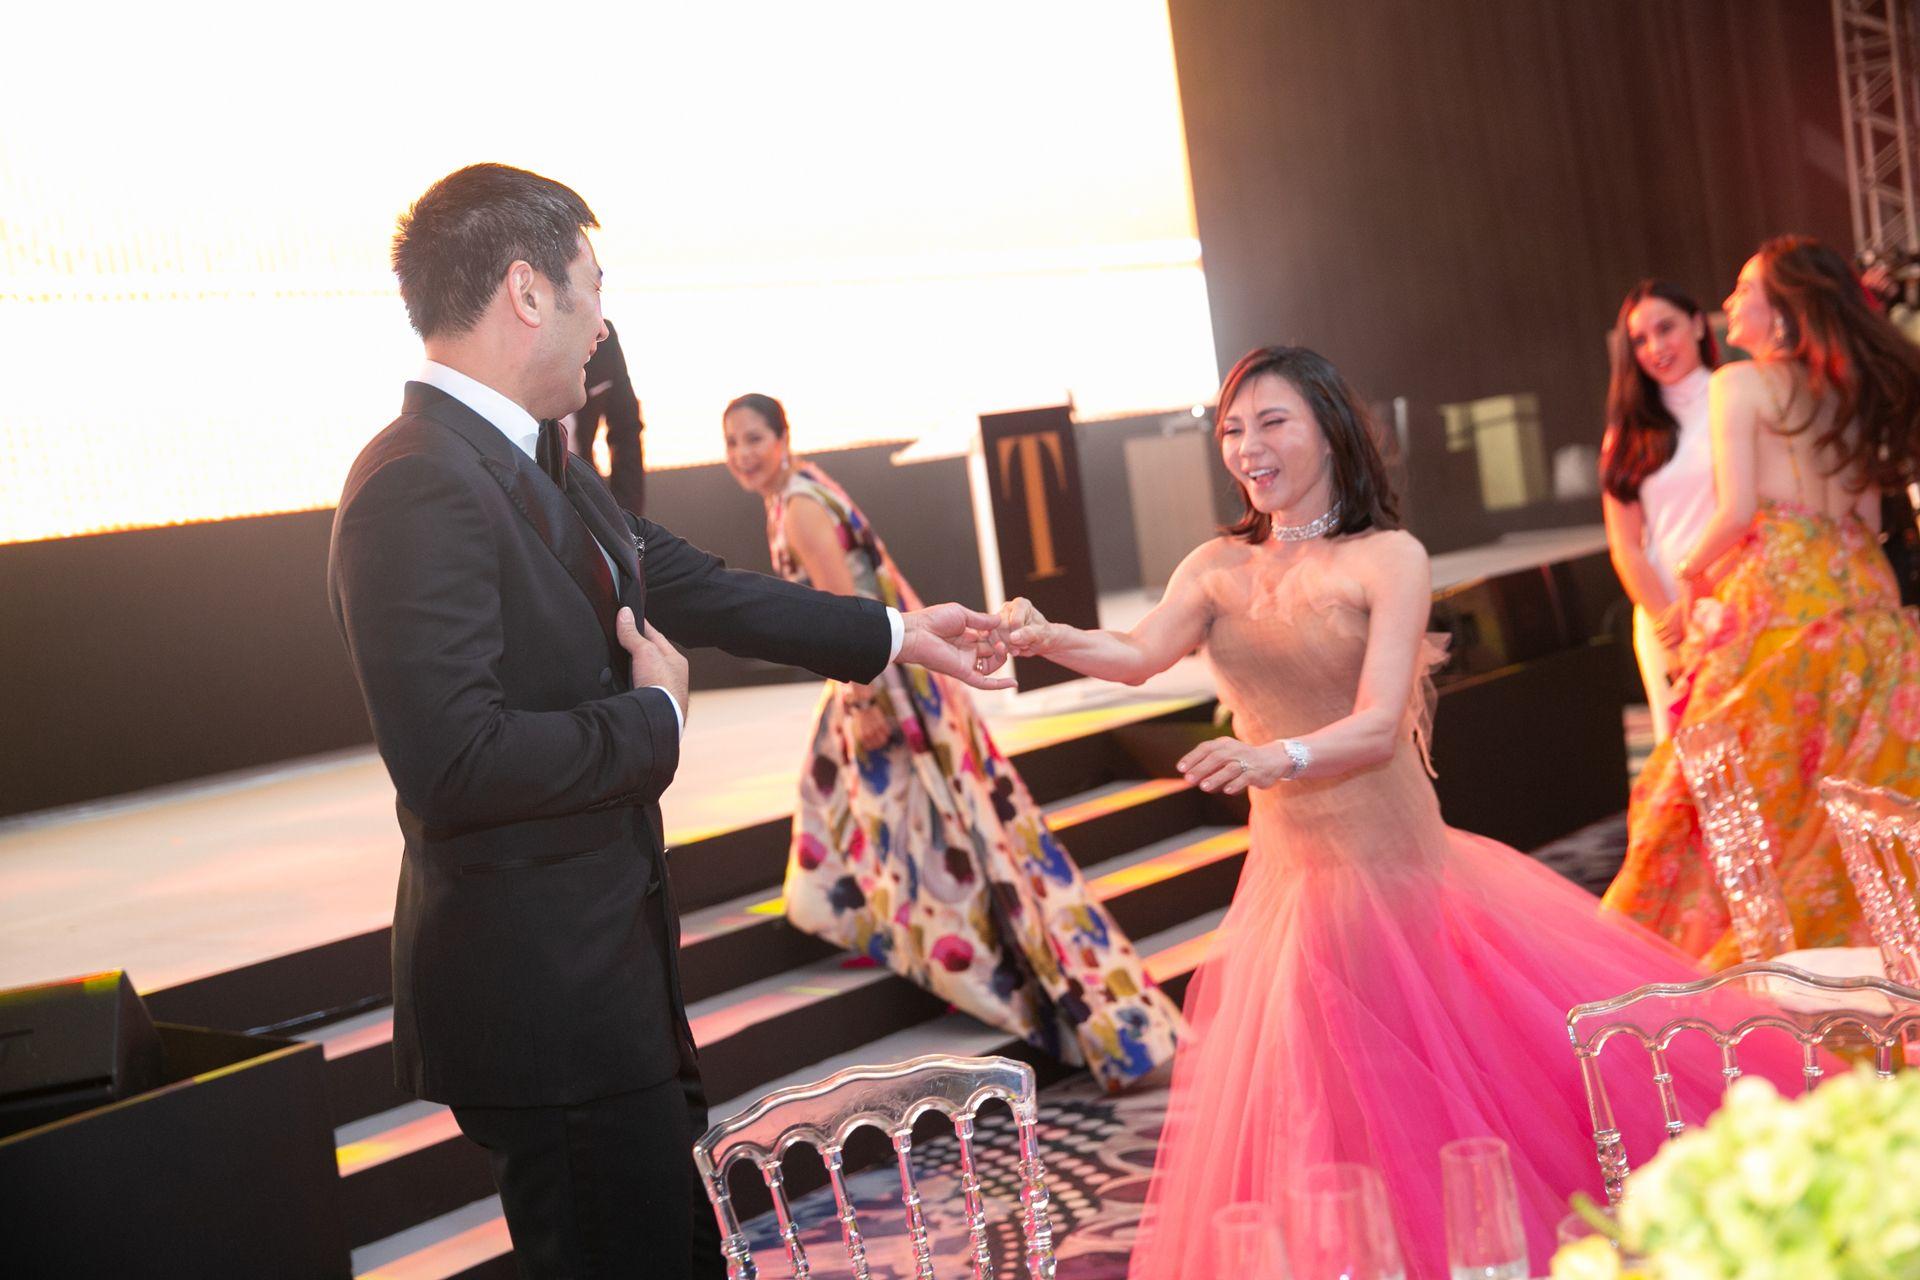 Hayden and Vicky Kho